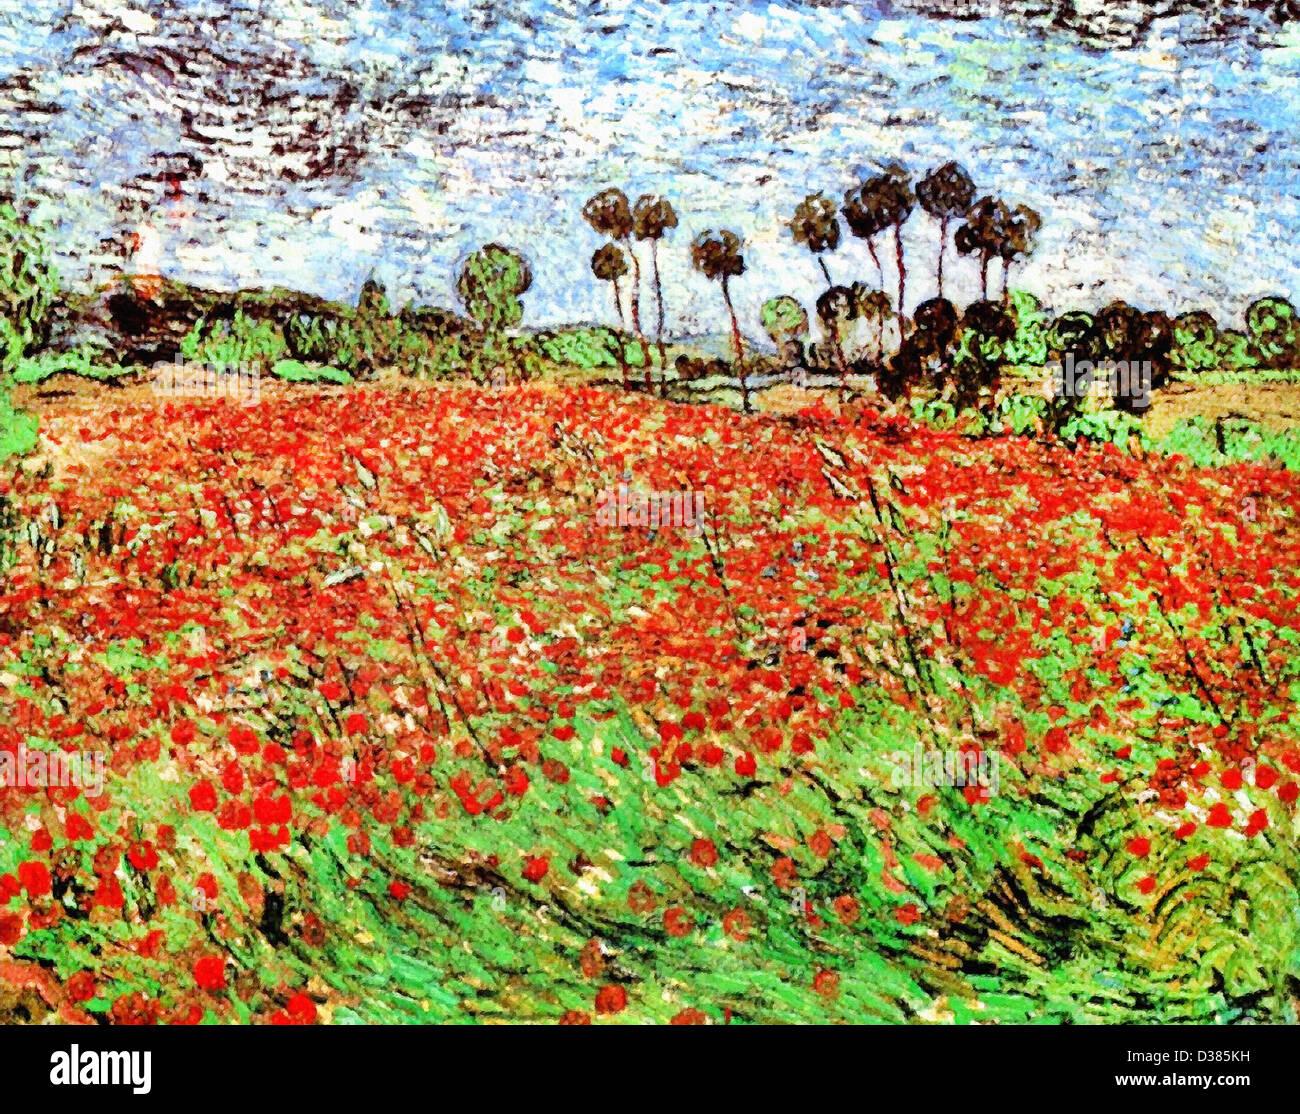 Vincent Van Gogh Feld Mit Mohnblumen 1890 Post Impressionismus Ol Auf Leinwand Haags Gemeentemuseum Haag Niederlande Stockfotografie Alamy